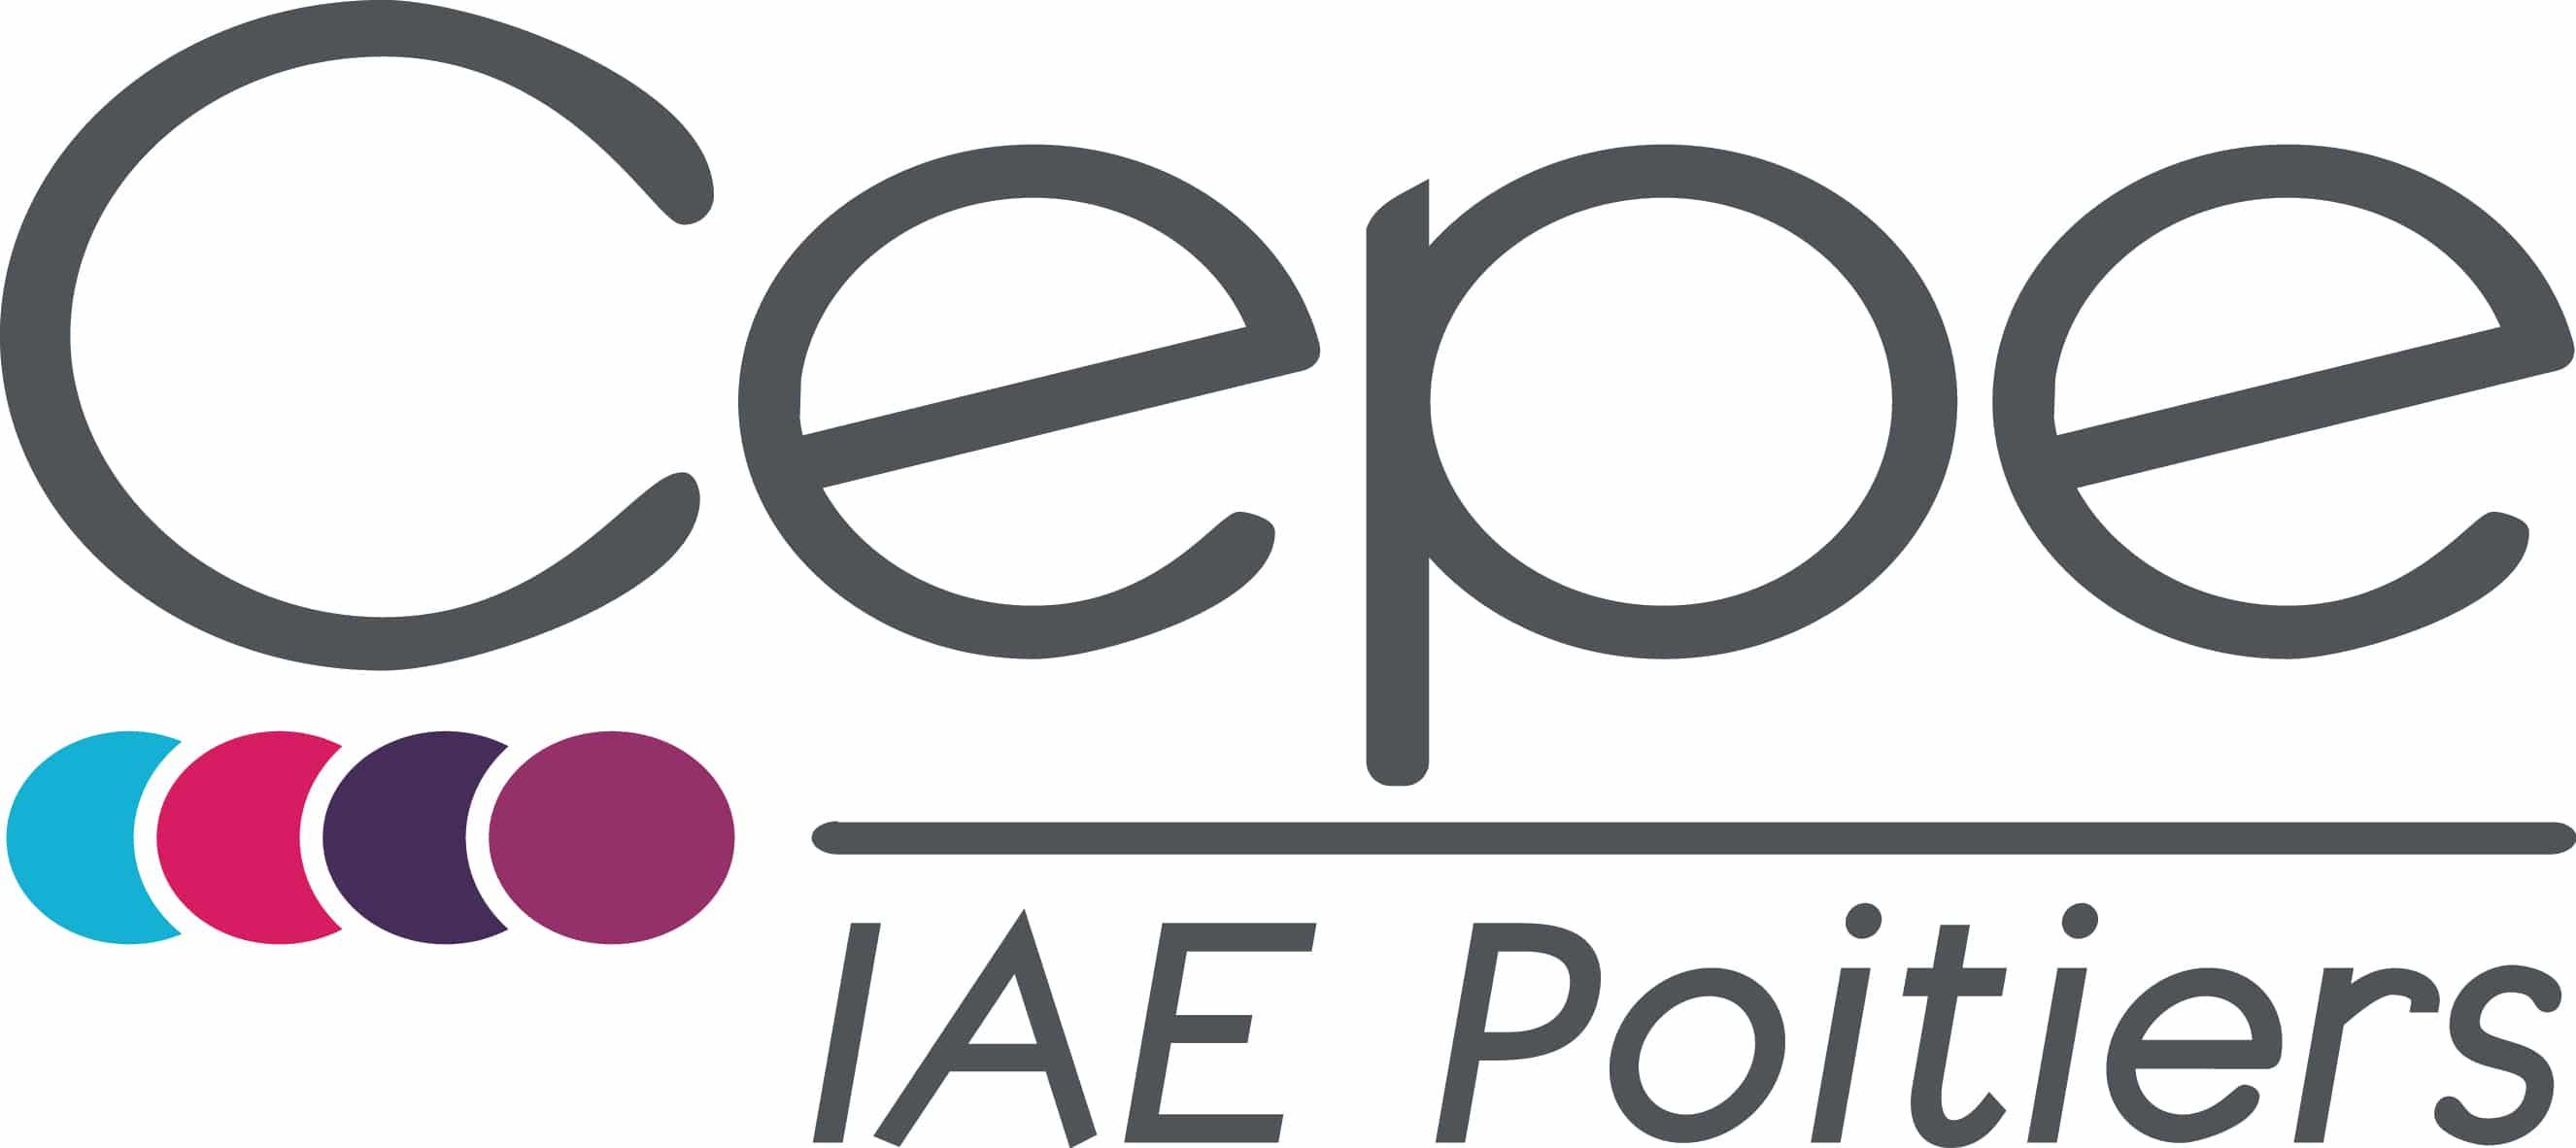 CEPE LOGO 2015 pied IAE-haute definition (3)